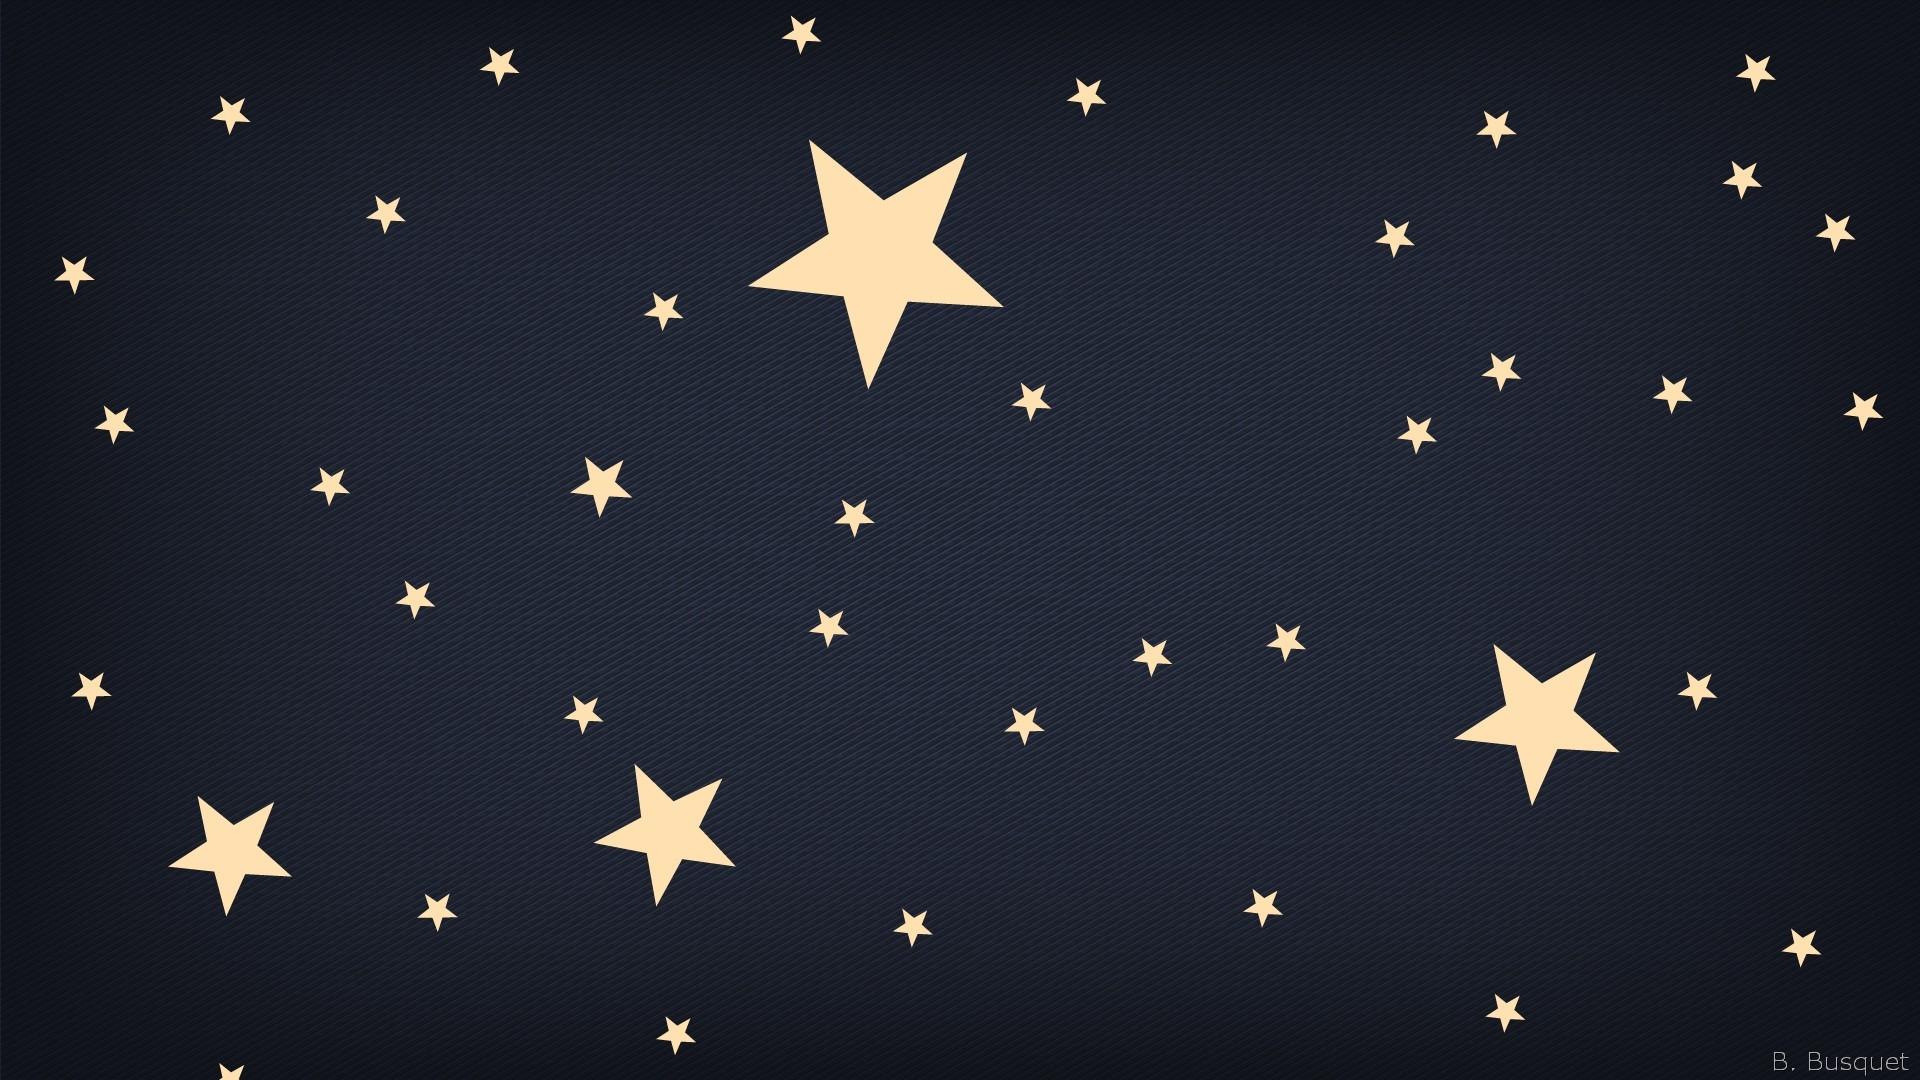 Star Wallpapers - Barbaras HD Wallpapers